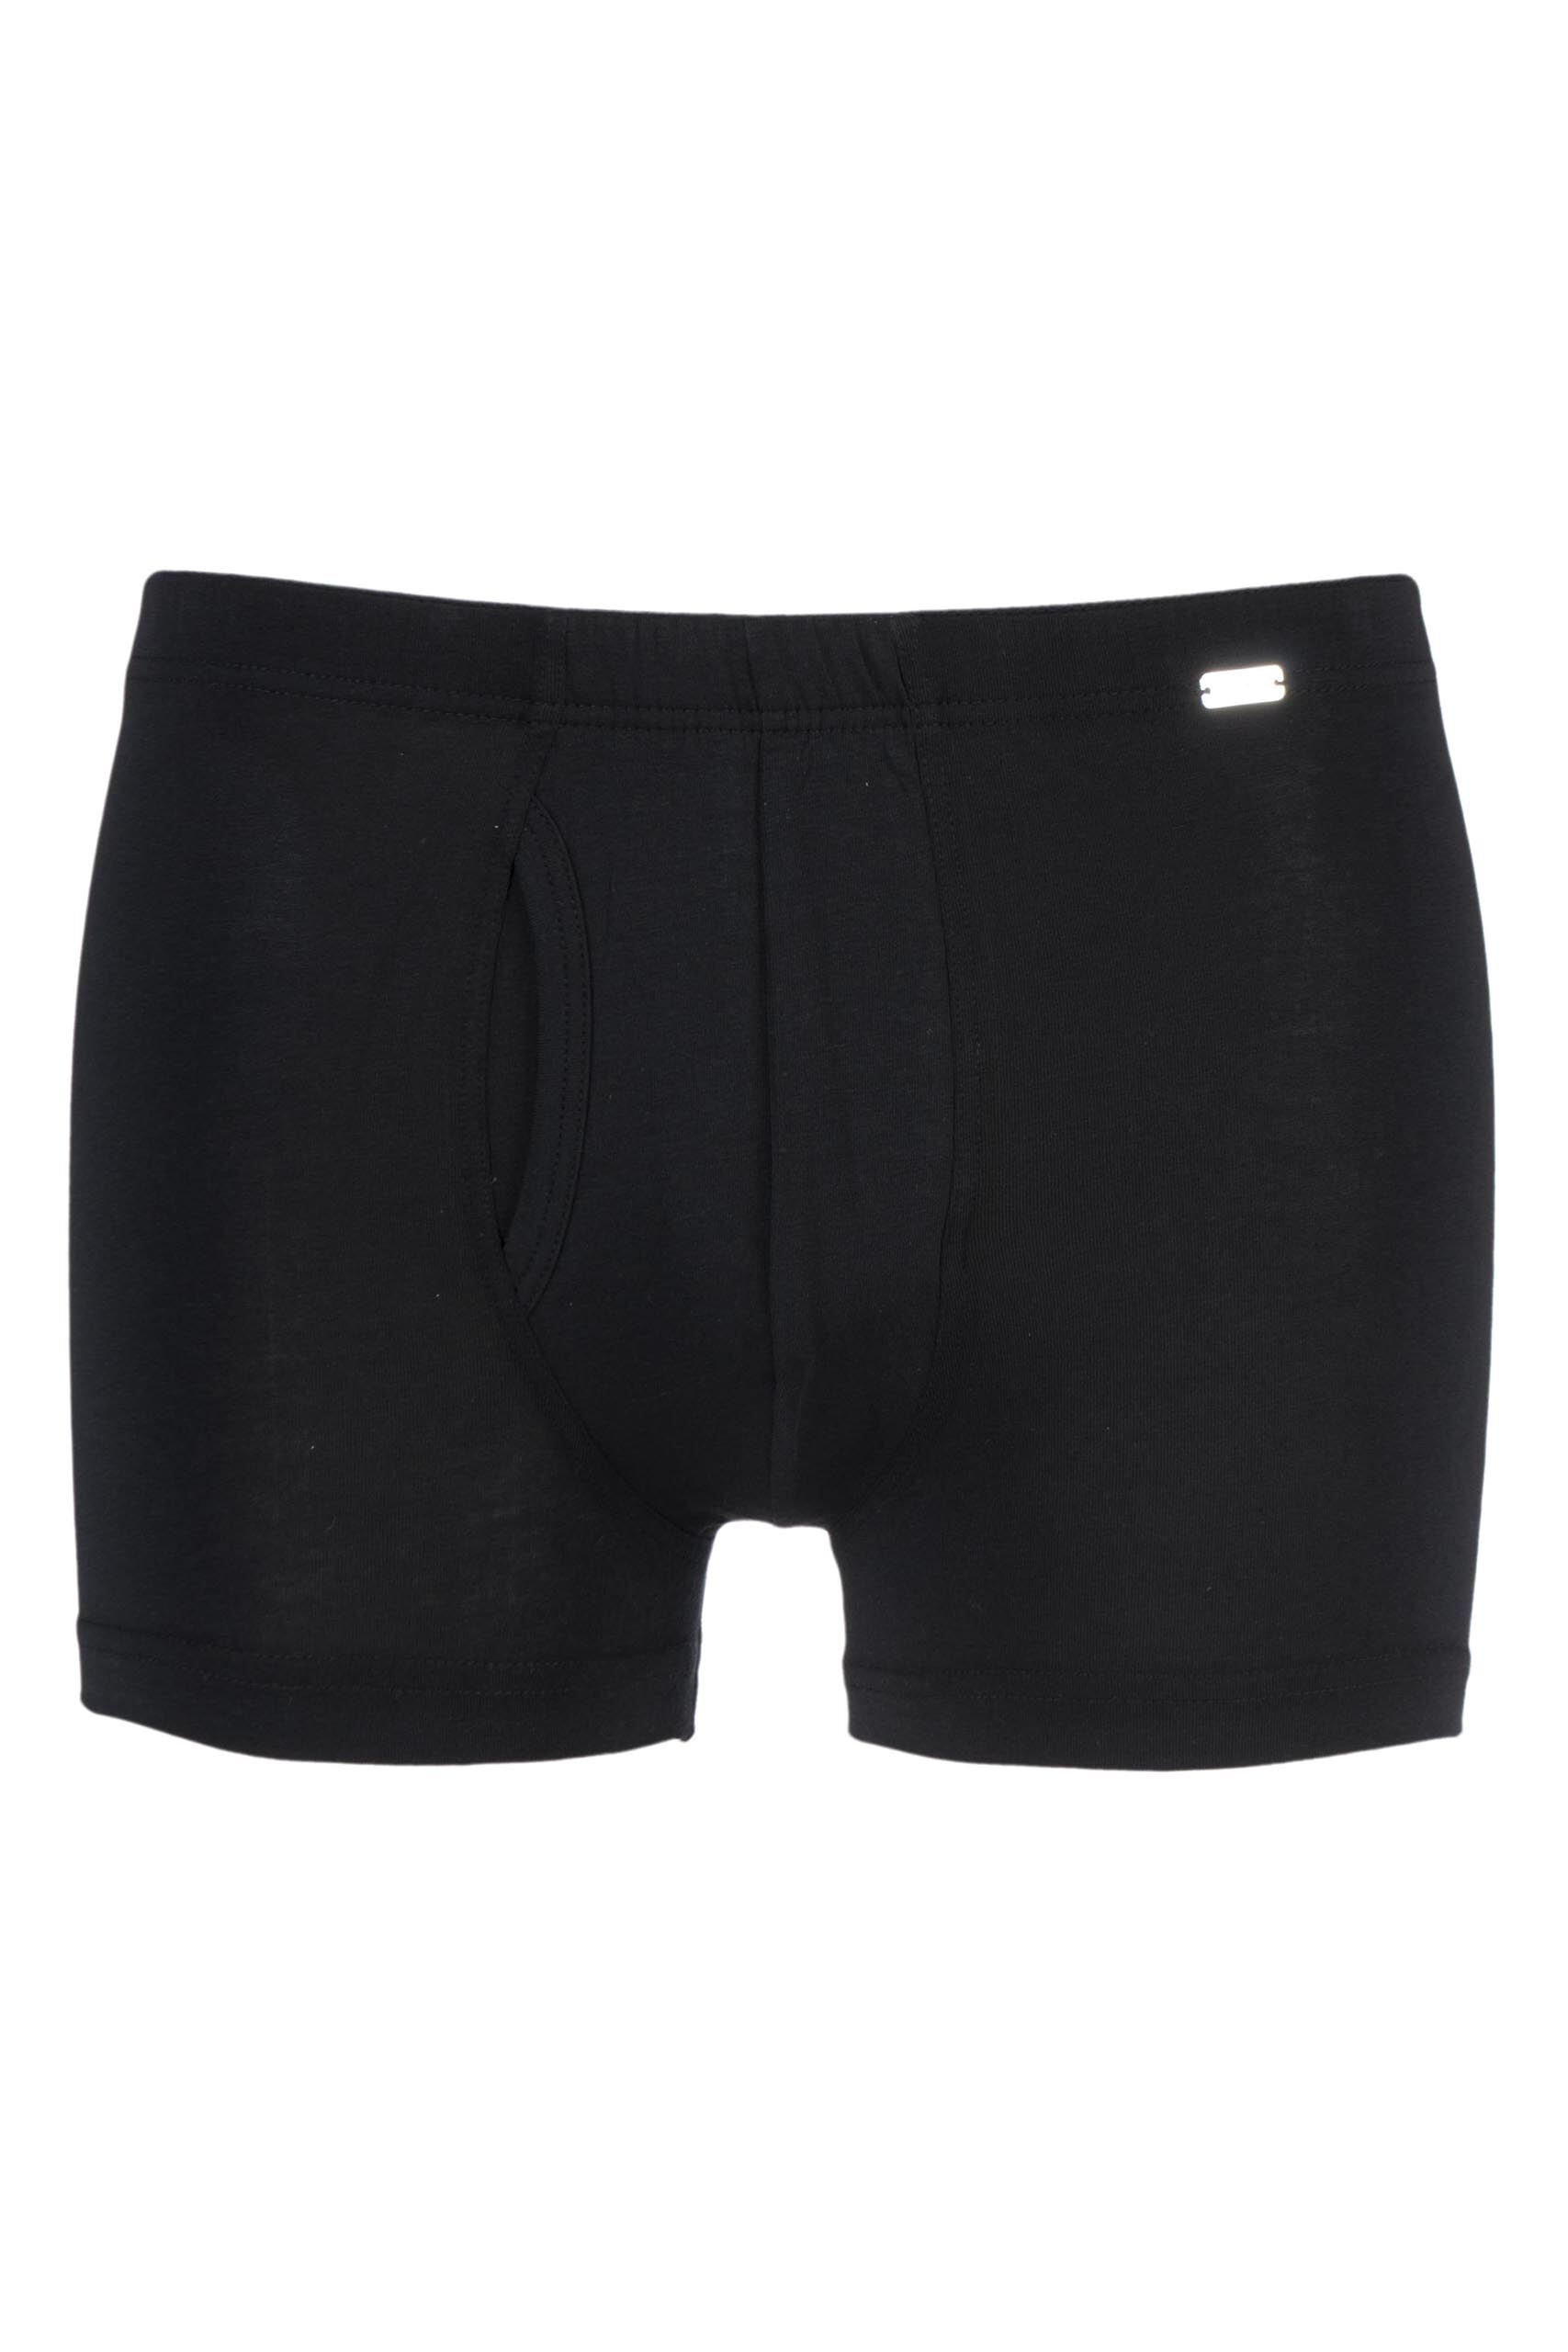 Image of 1 Pack Black Modern Stretch Comfort Trunks Men's Large - Jockey